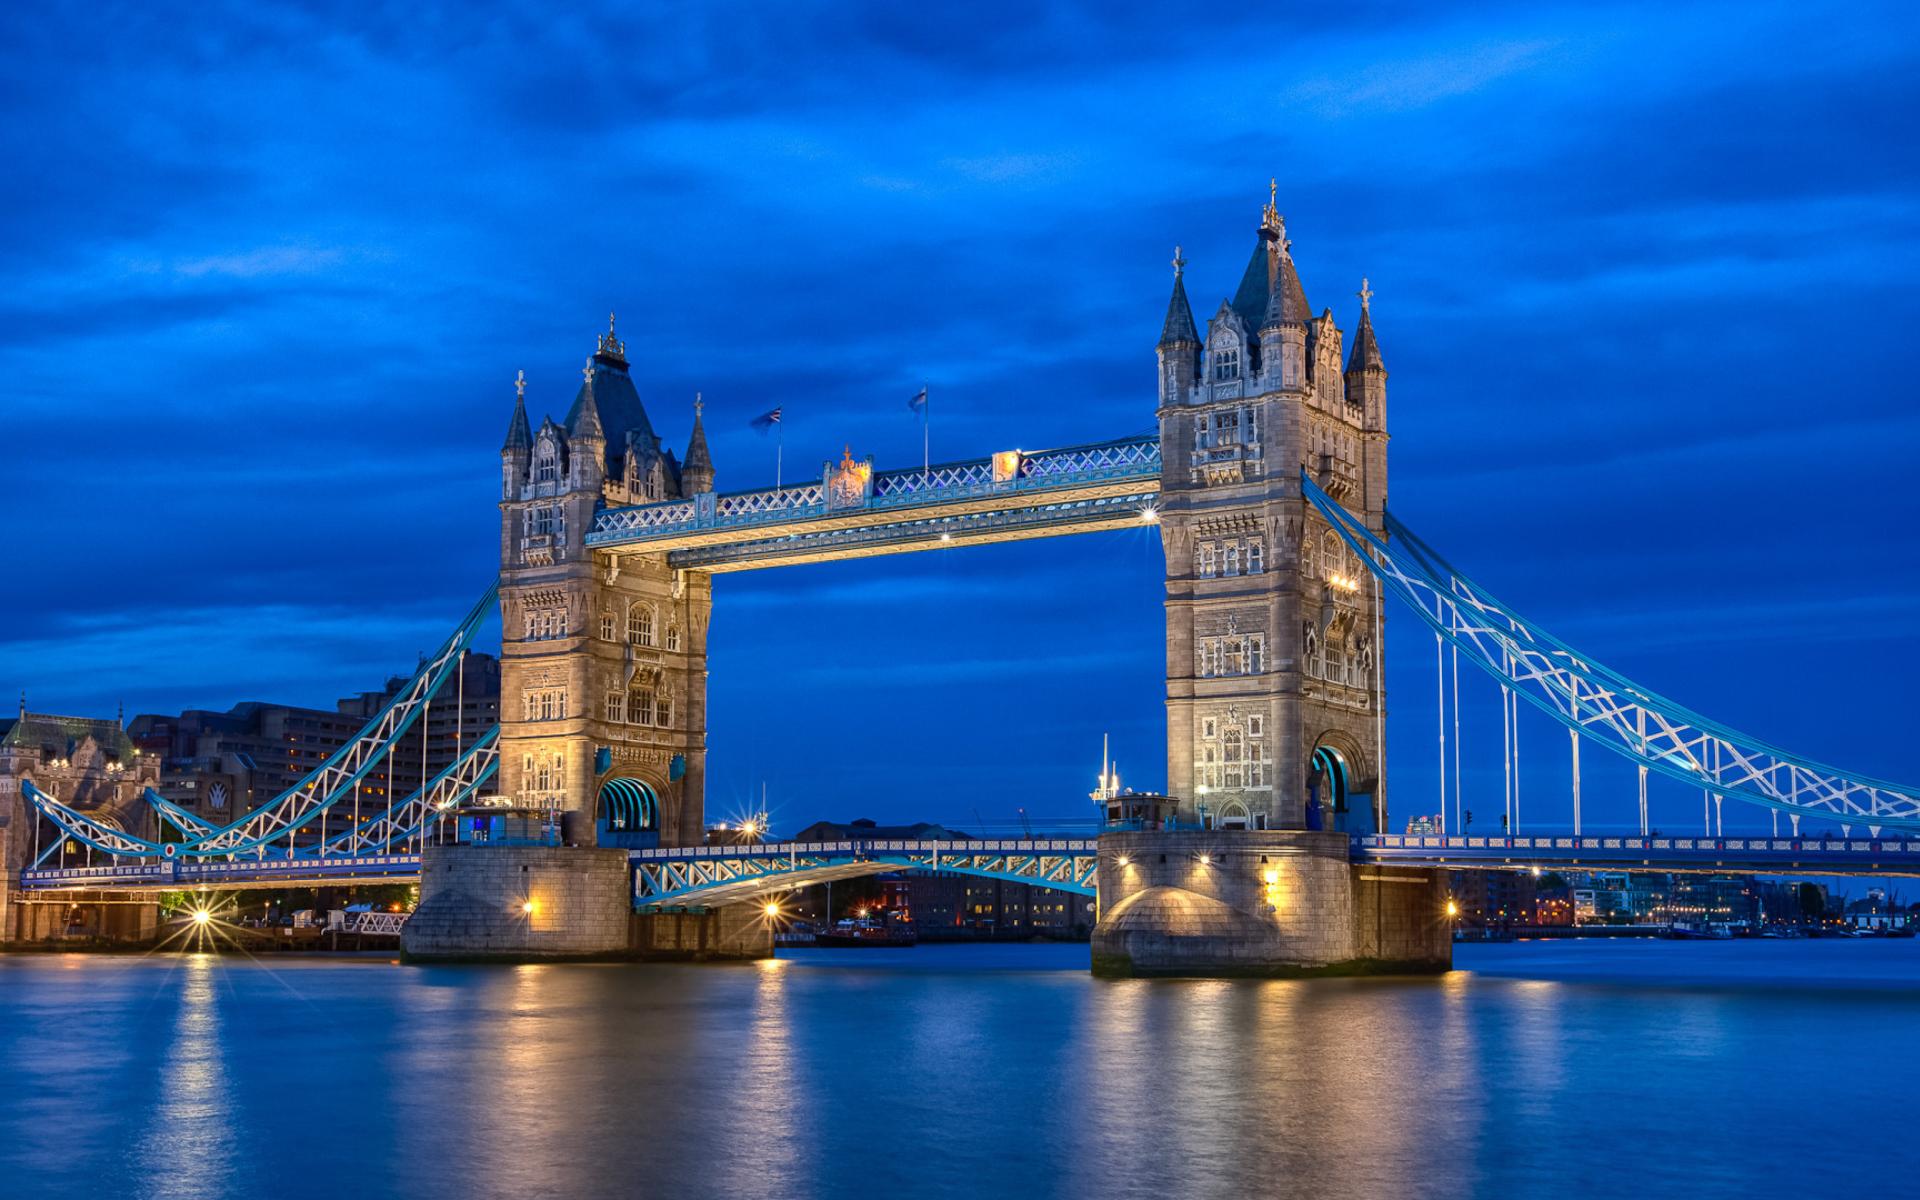 Tower Bridge In London Wallpaper For Widescreen Desktop PC